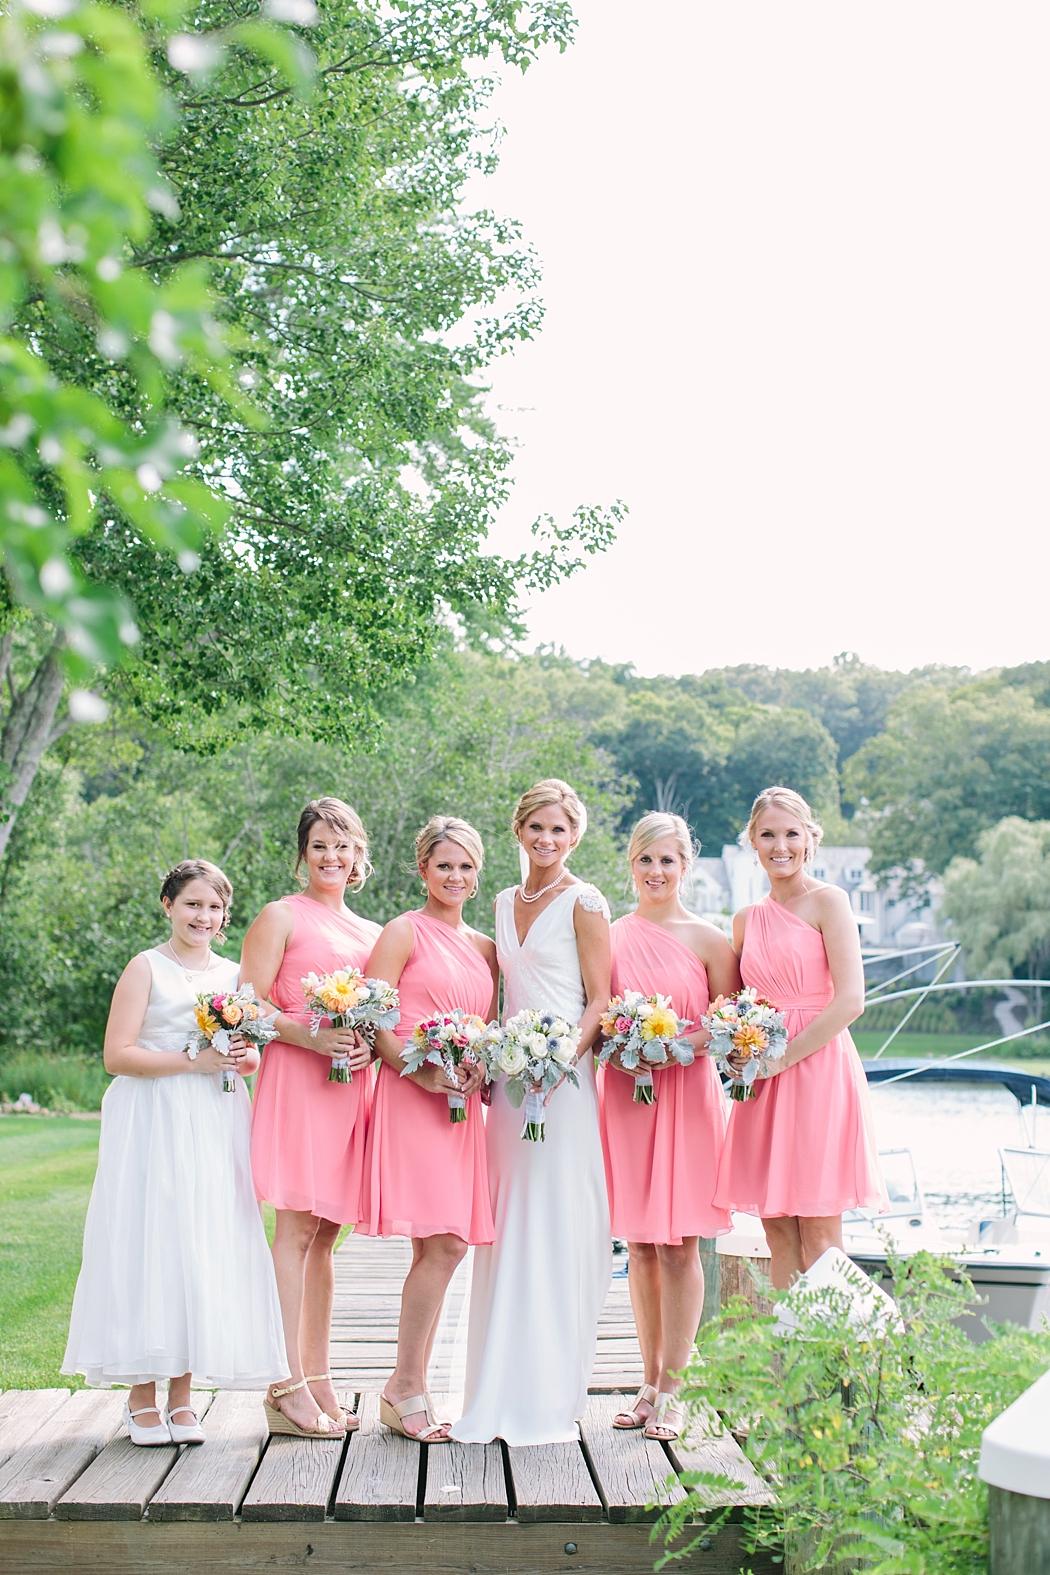 © Erin McGinn Photography | www.erinmcginn.com | ct wedding photographer